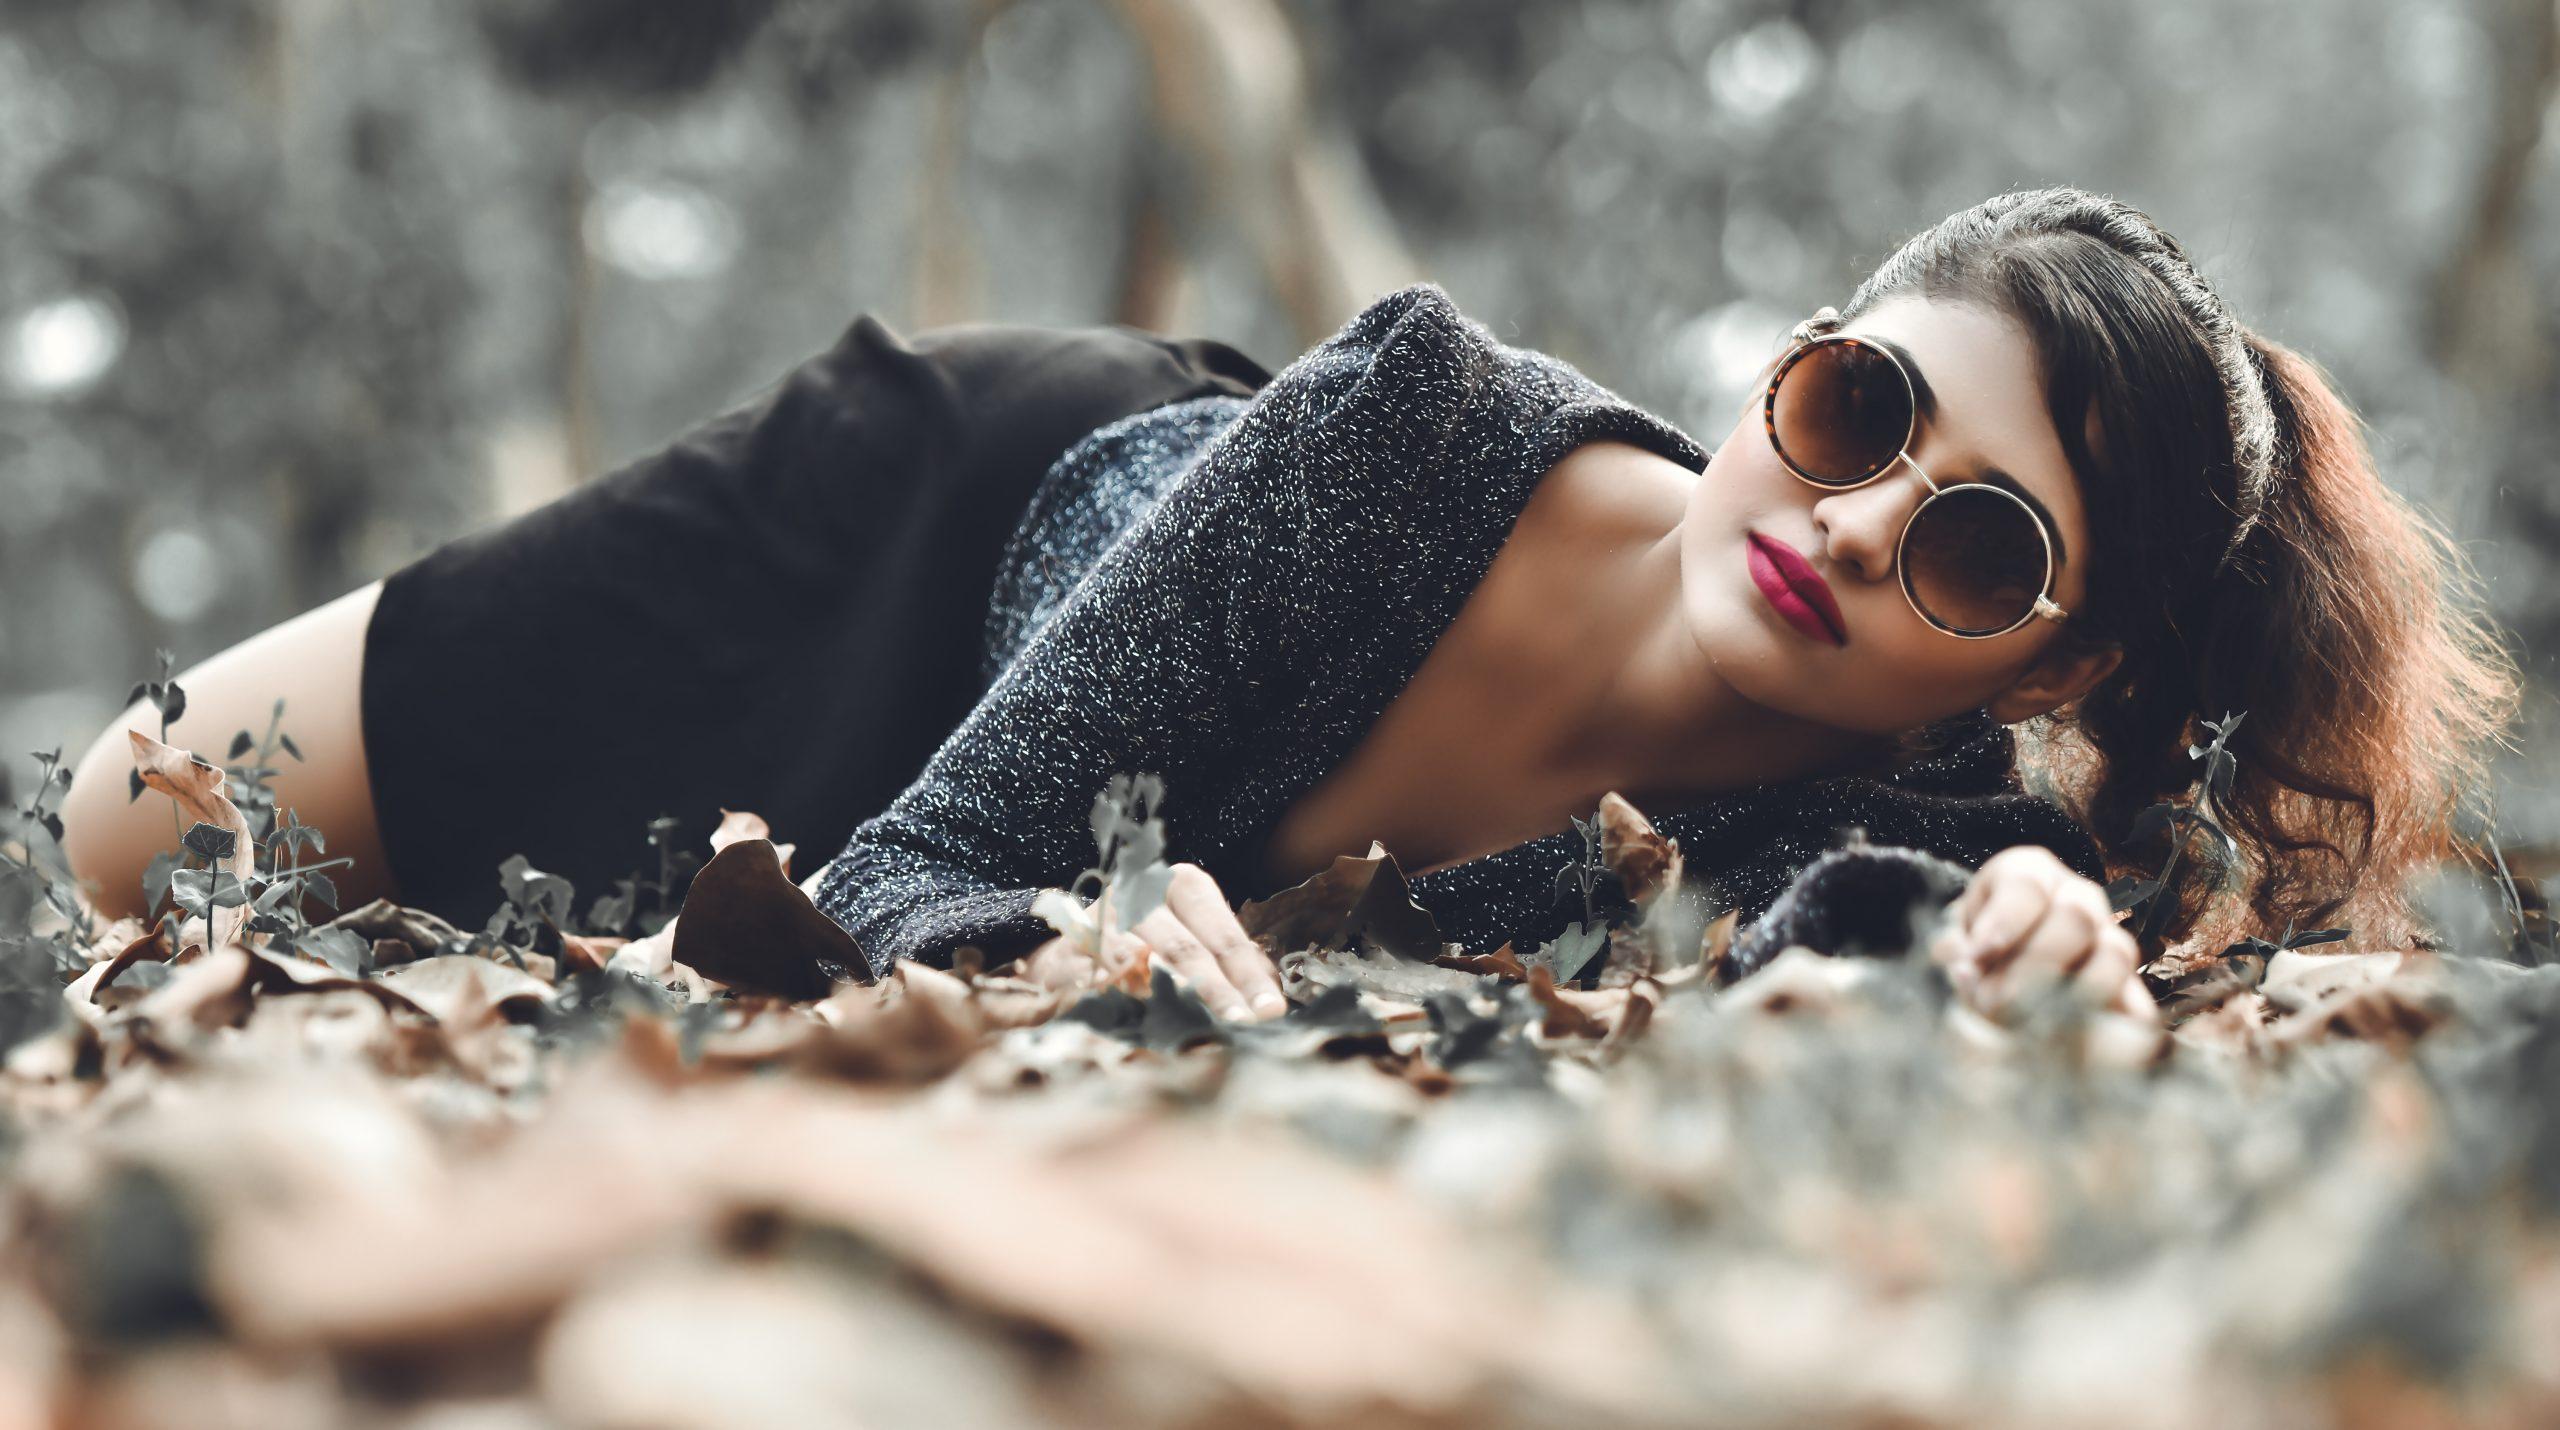 Female model posing with sunglasses